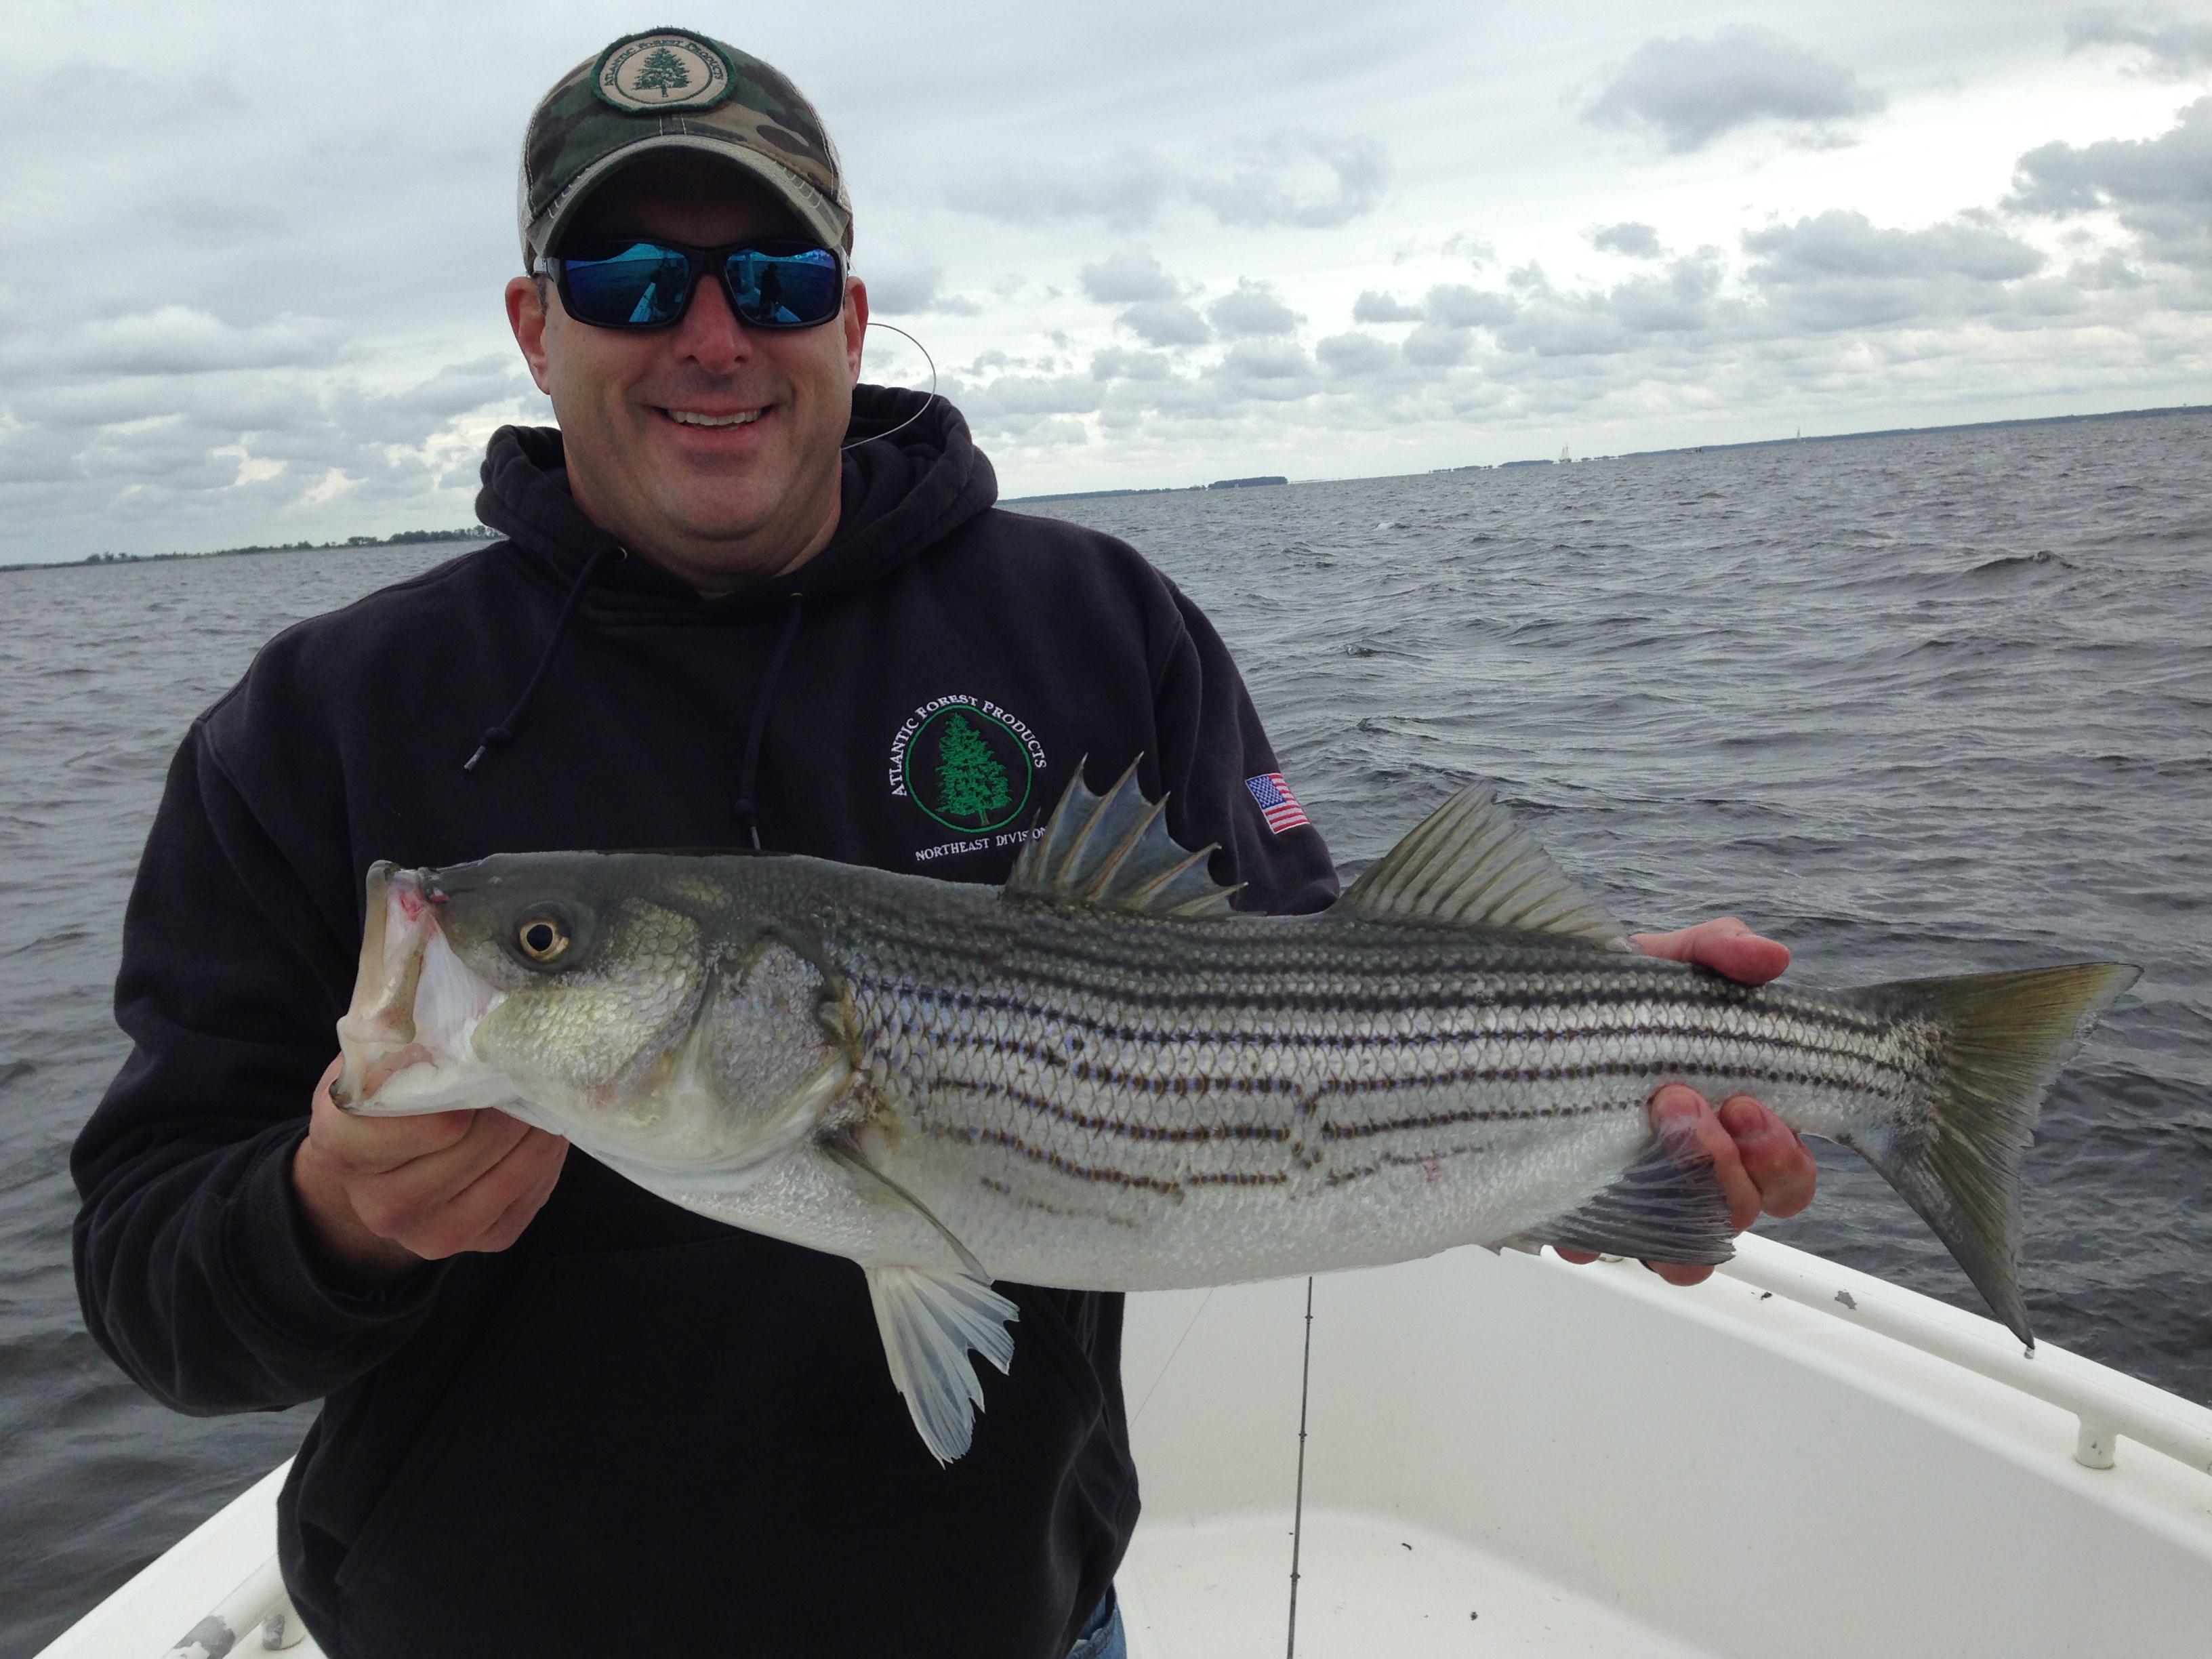 5 13 17 fly fish the chesapeake bay for Fishing chesapeake bay